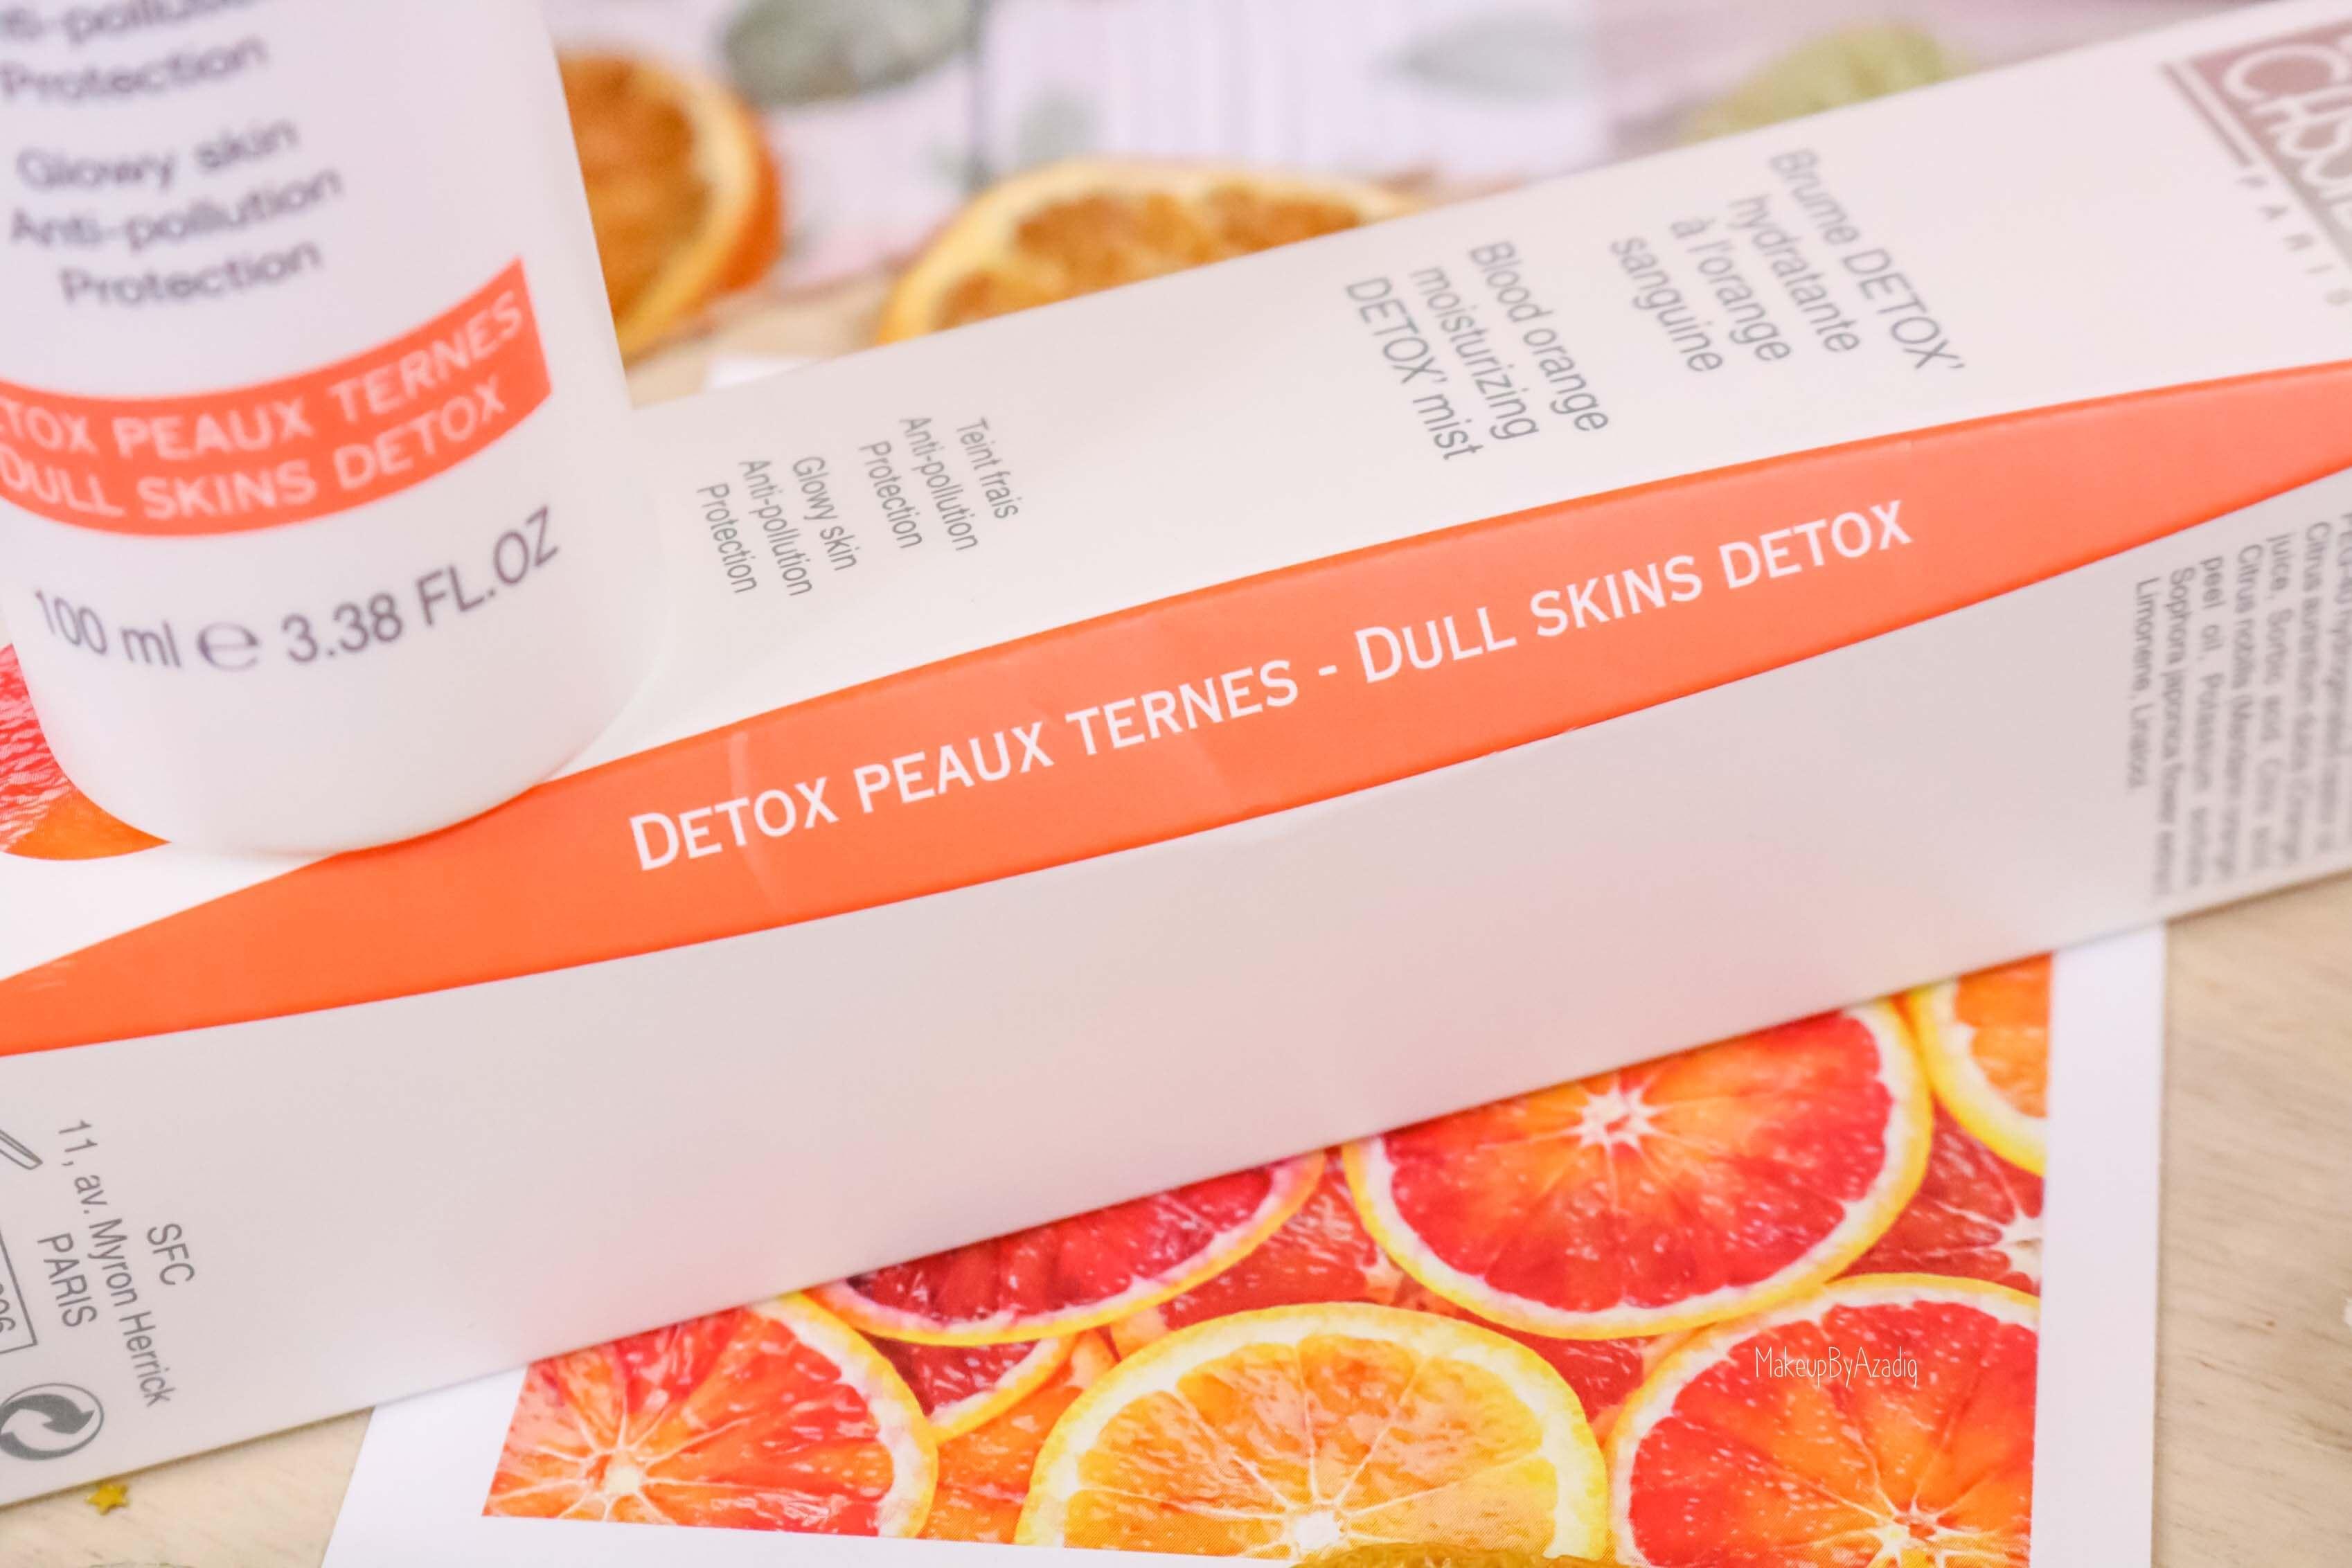 revue-produits-bernard-cassiere-bio-detox-orange-sanguine-masque-paris-institut-concentre-nuit-avis-prix-soin-makeupbyazadig-mist